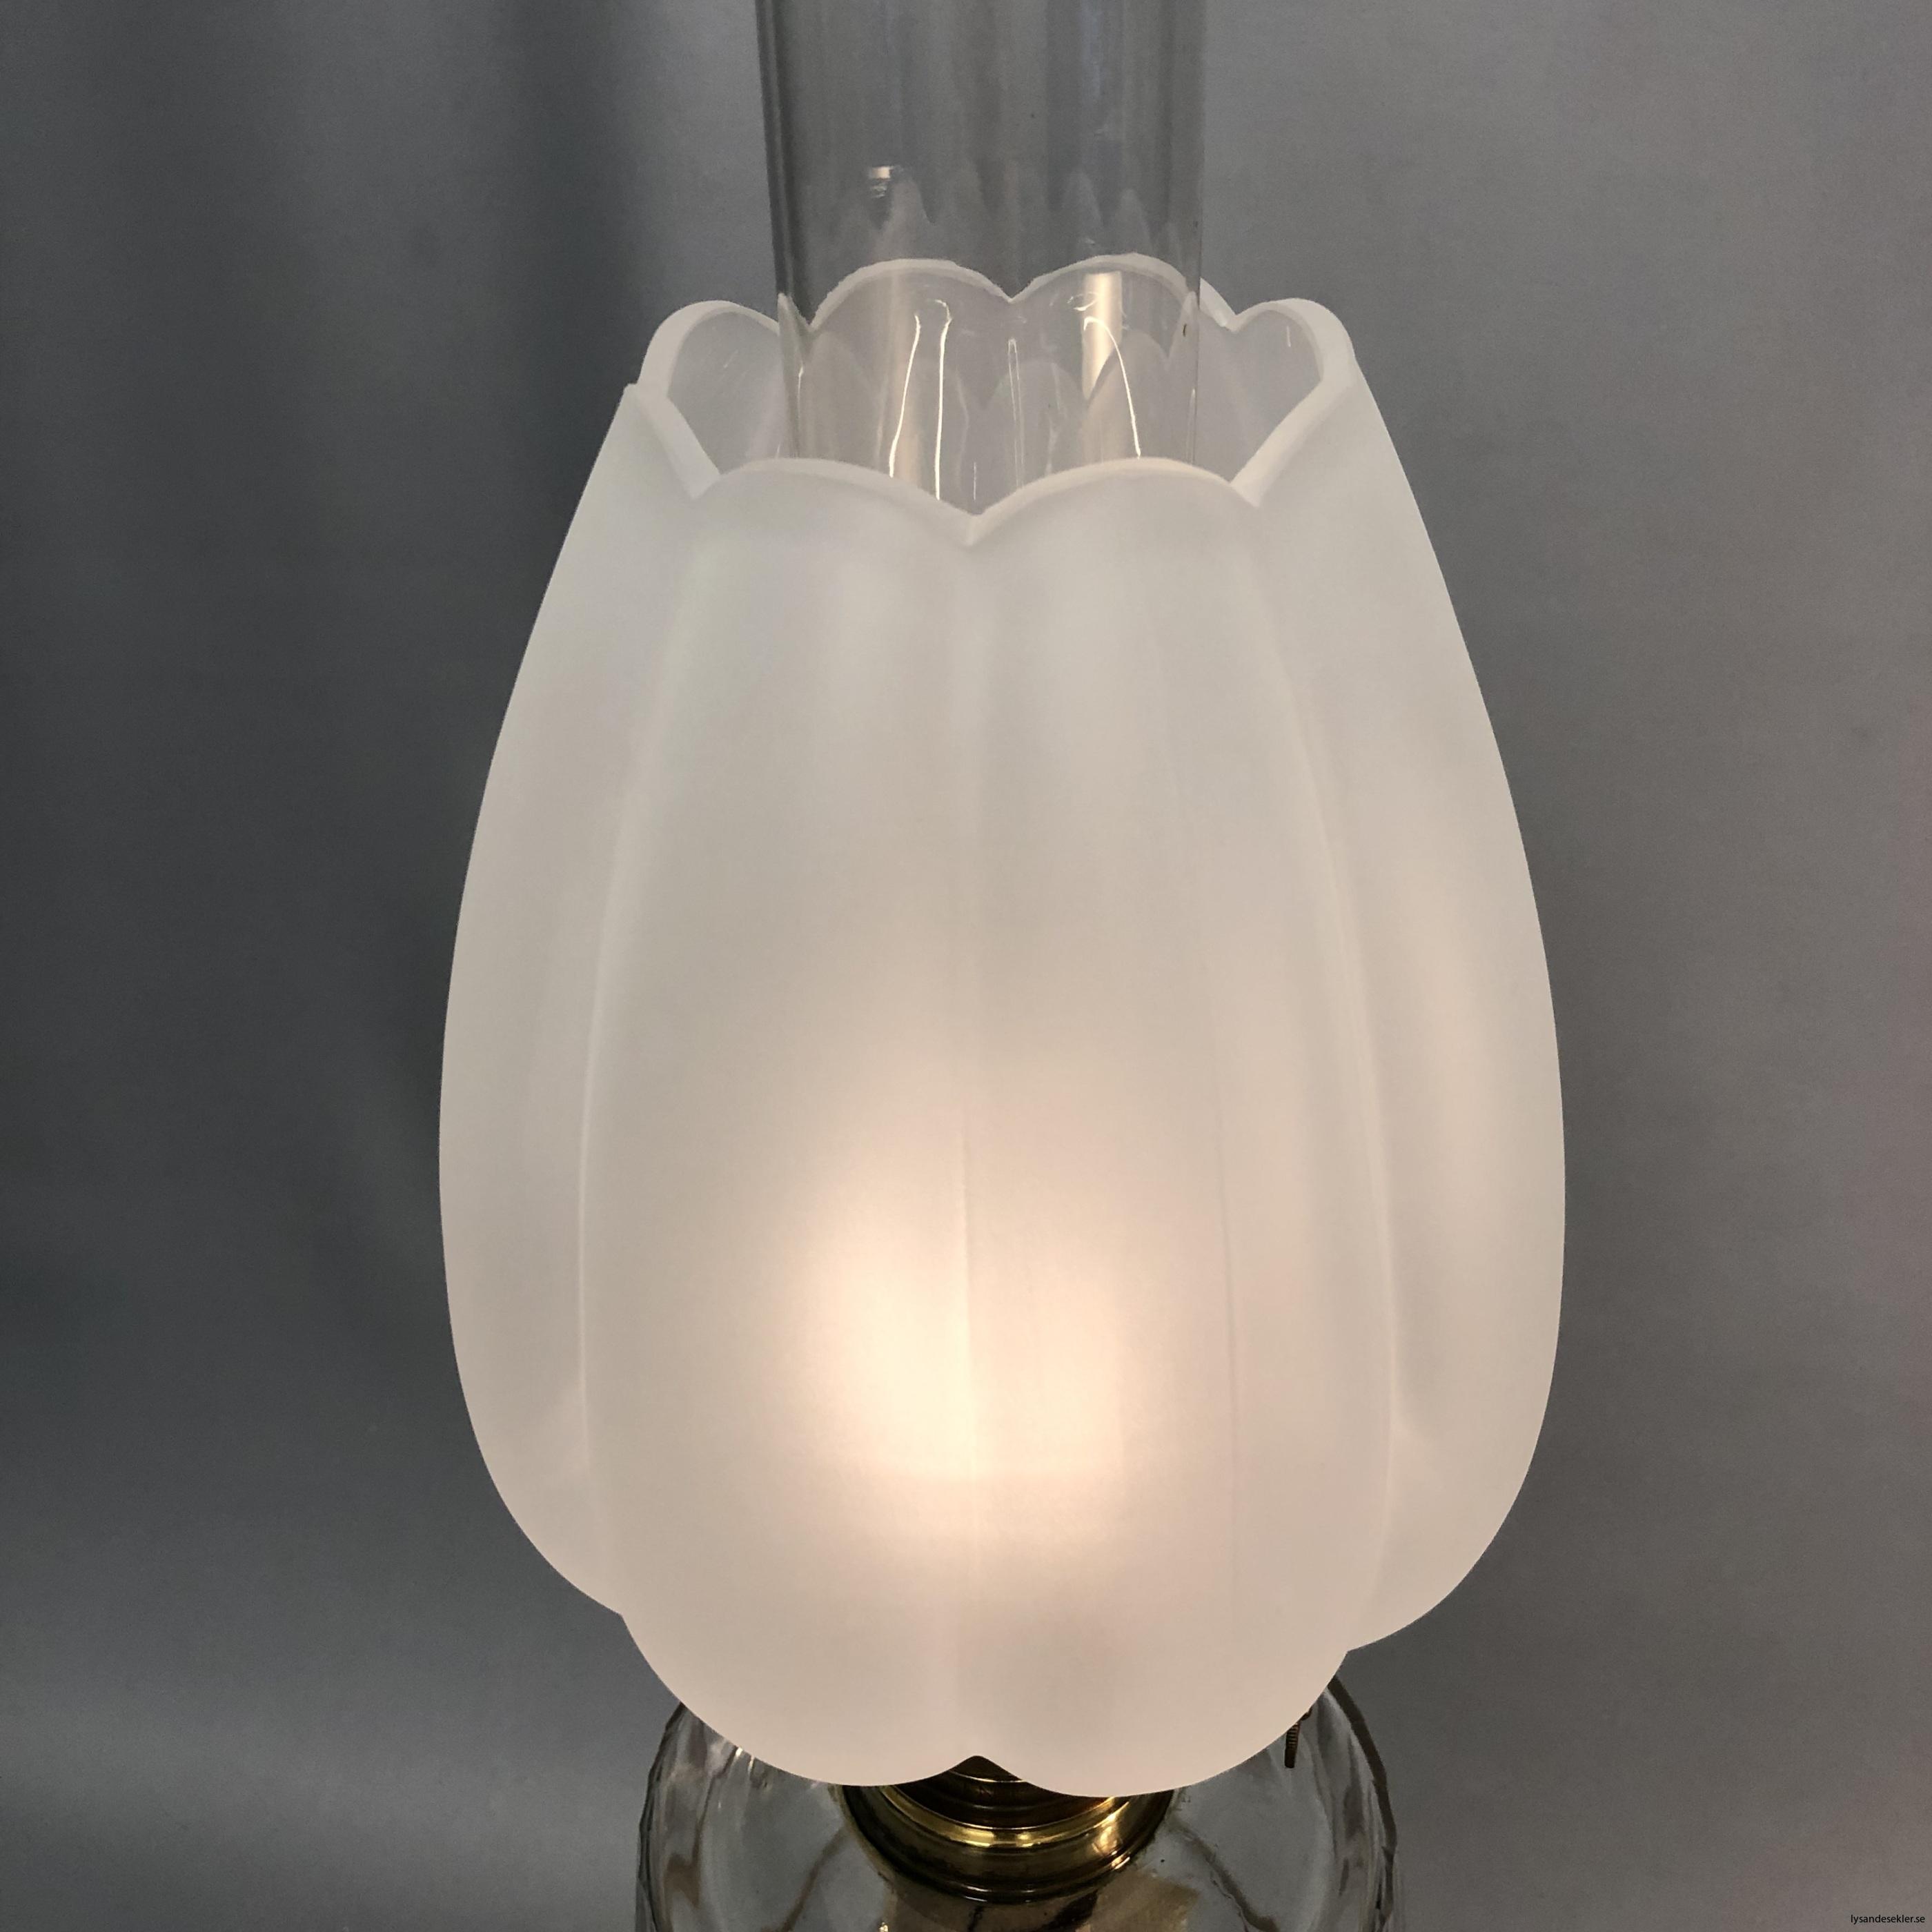 fotogenlampskupa kupa till fotogenlampa tulipan tulpan tulpankupor kupor27